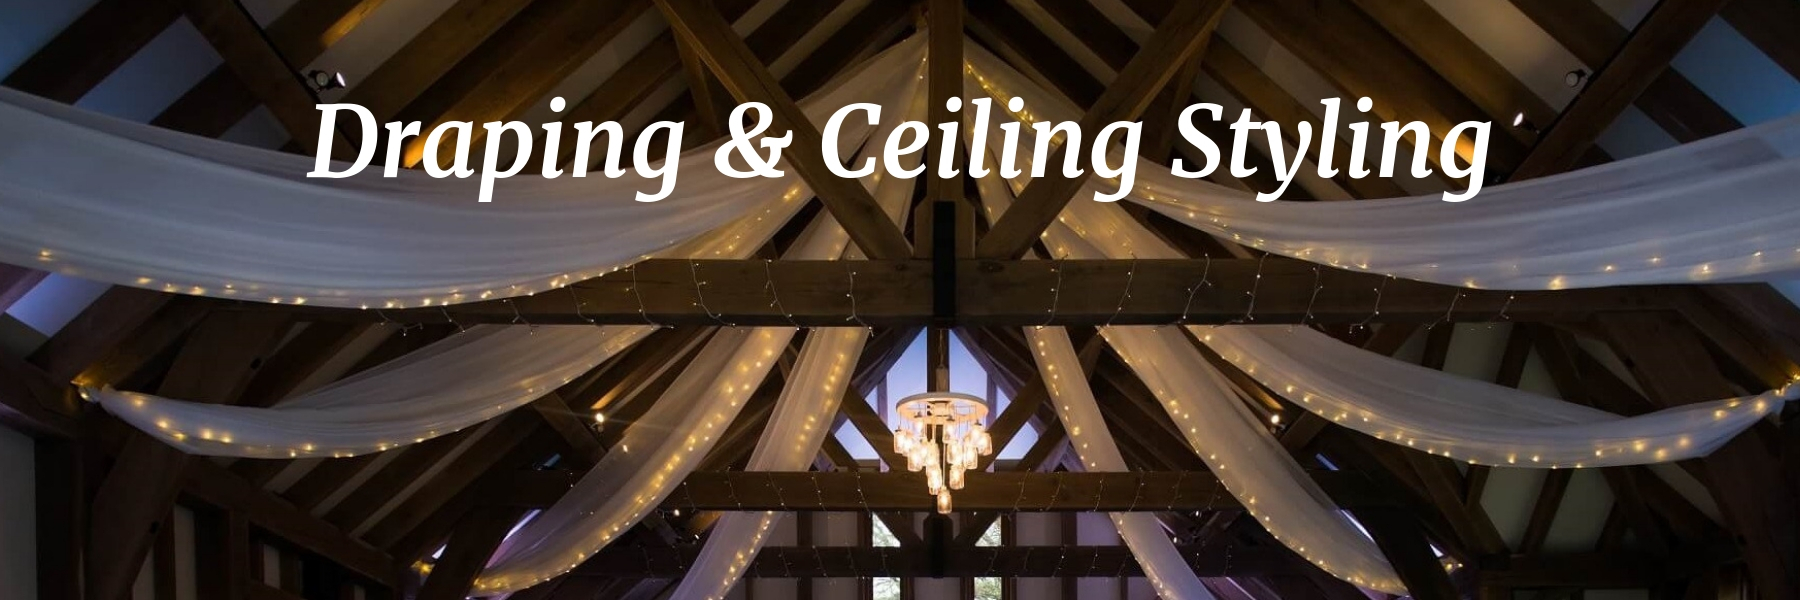 draping_ceiling_decor.jpg